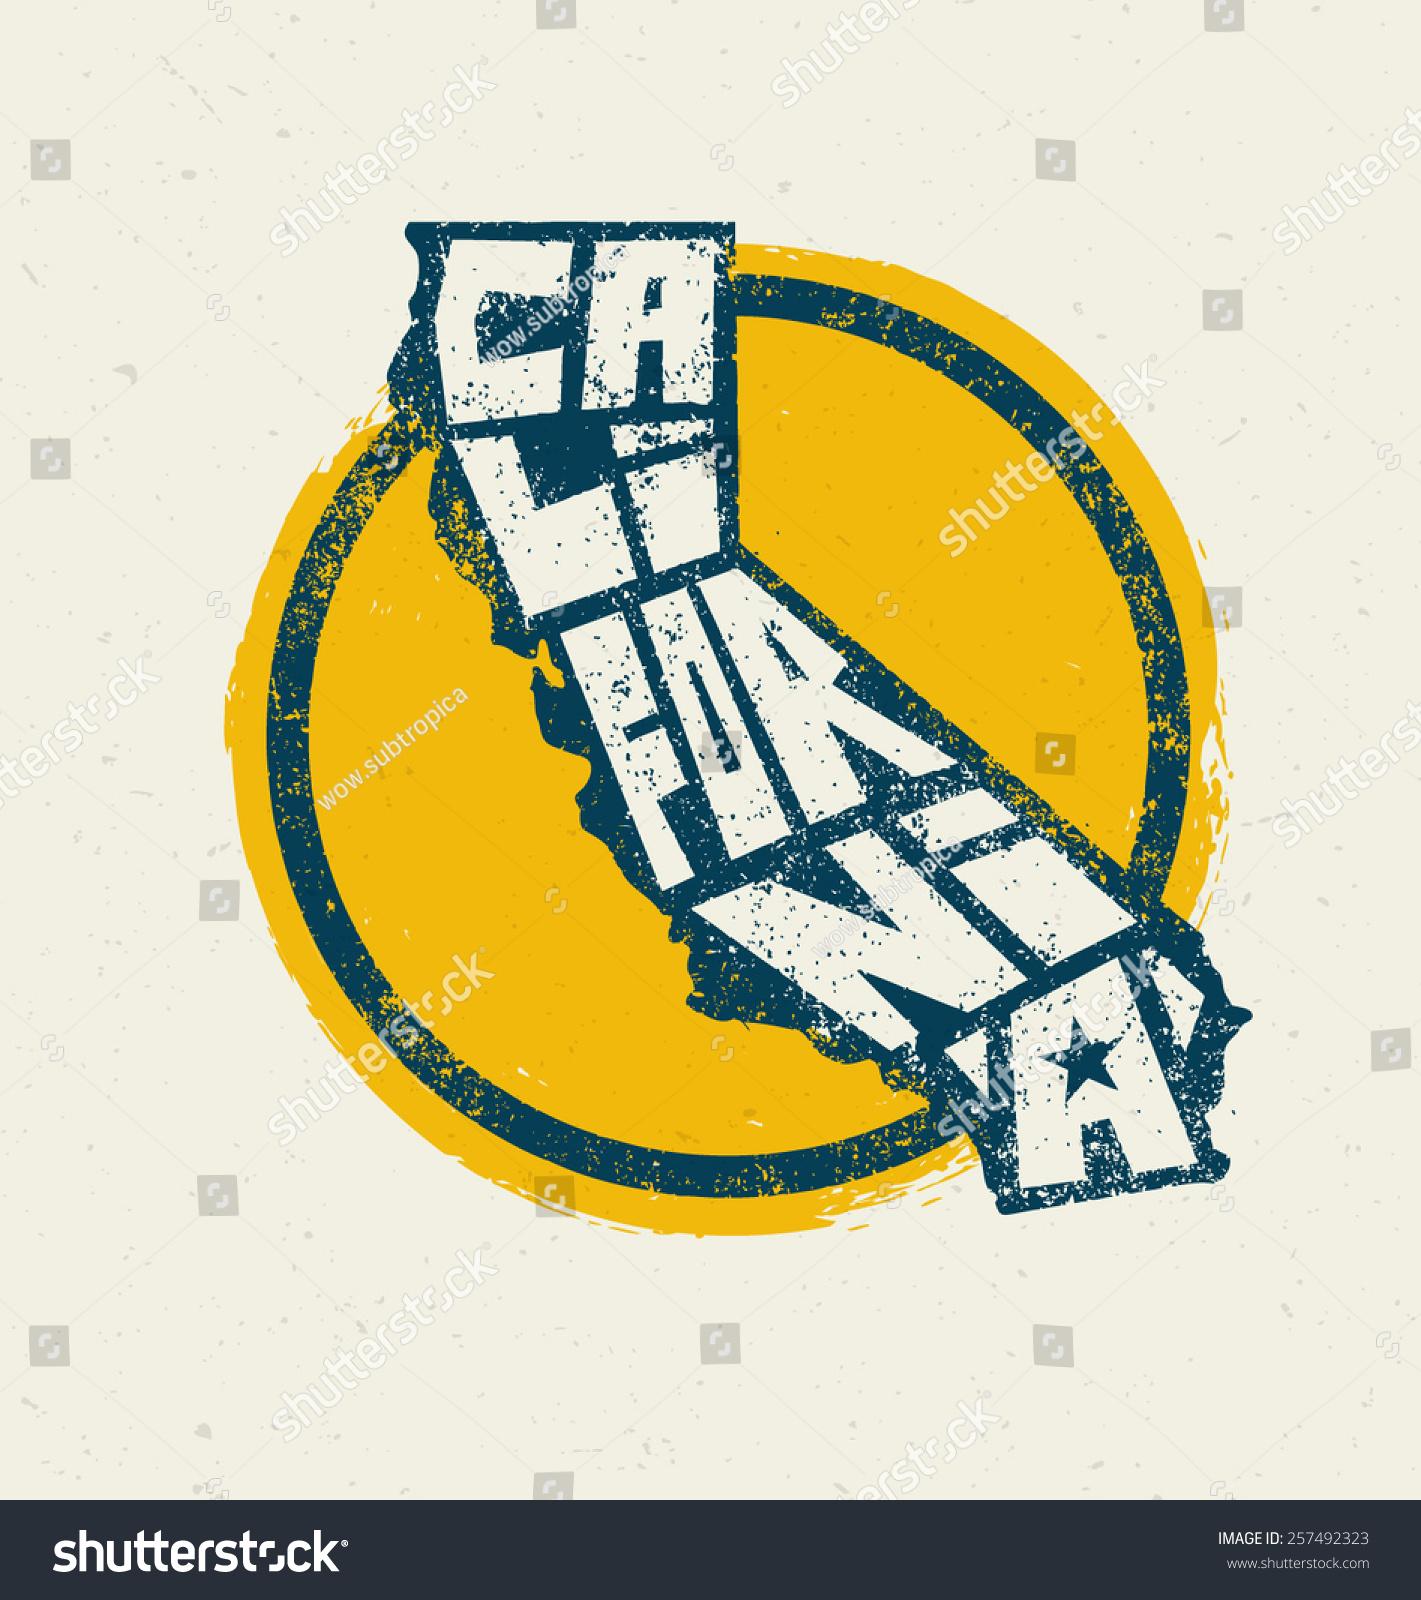 California state tshirt print vector concept stock vector california state t shirt print vector concept creative lettering design element buycottarizona